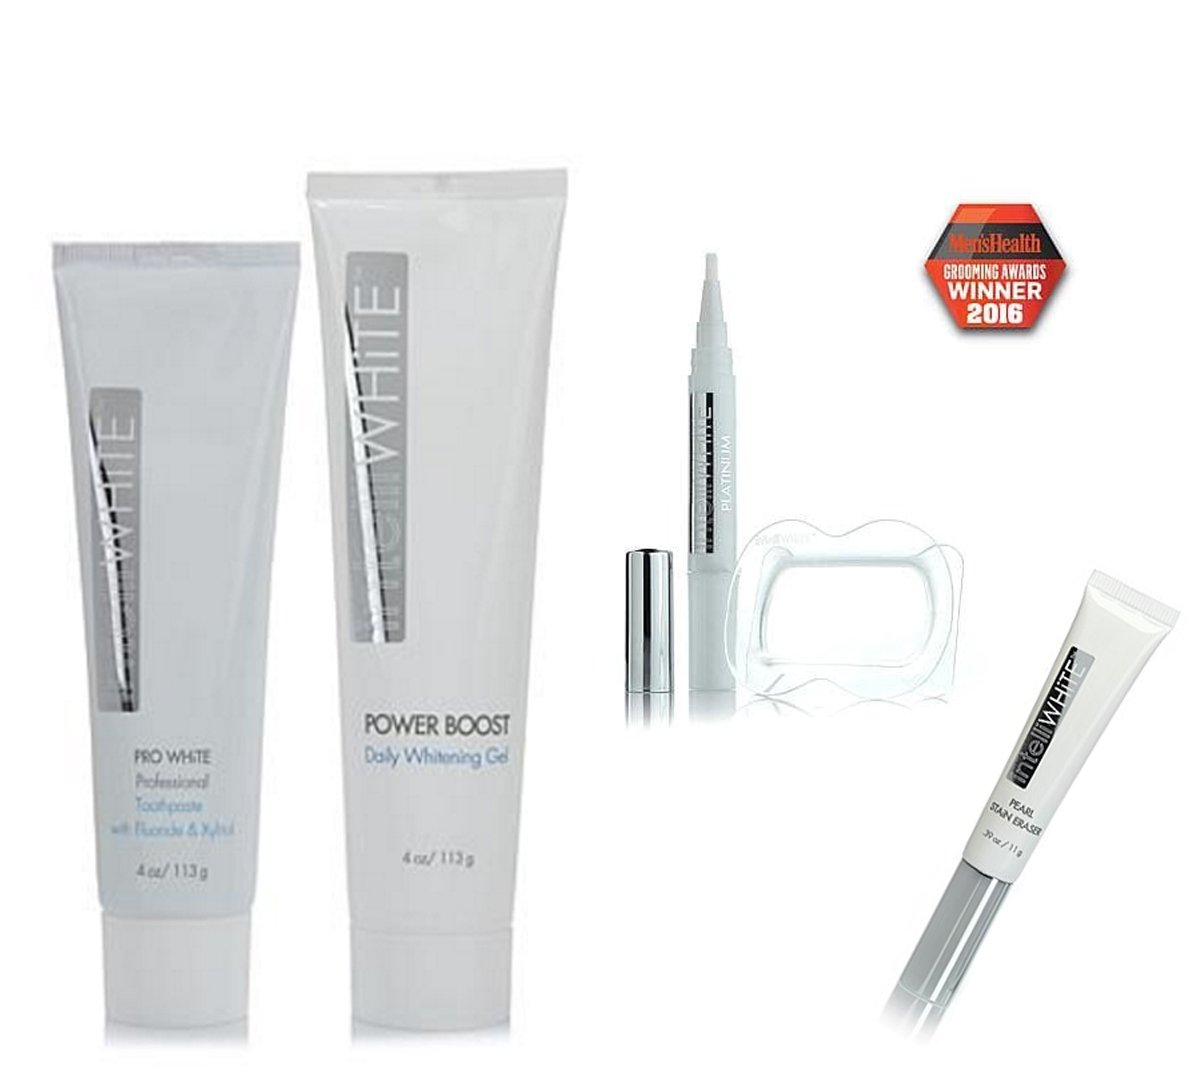 IntelliWHiTE 5-Piece Platinum Whitening System and Maintenance Kit ~ Whiten & Brighten